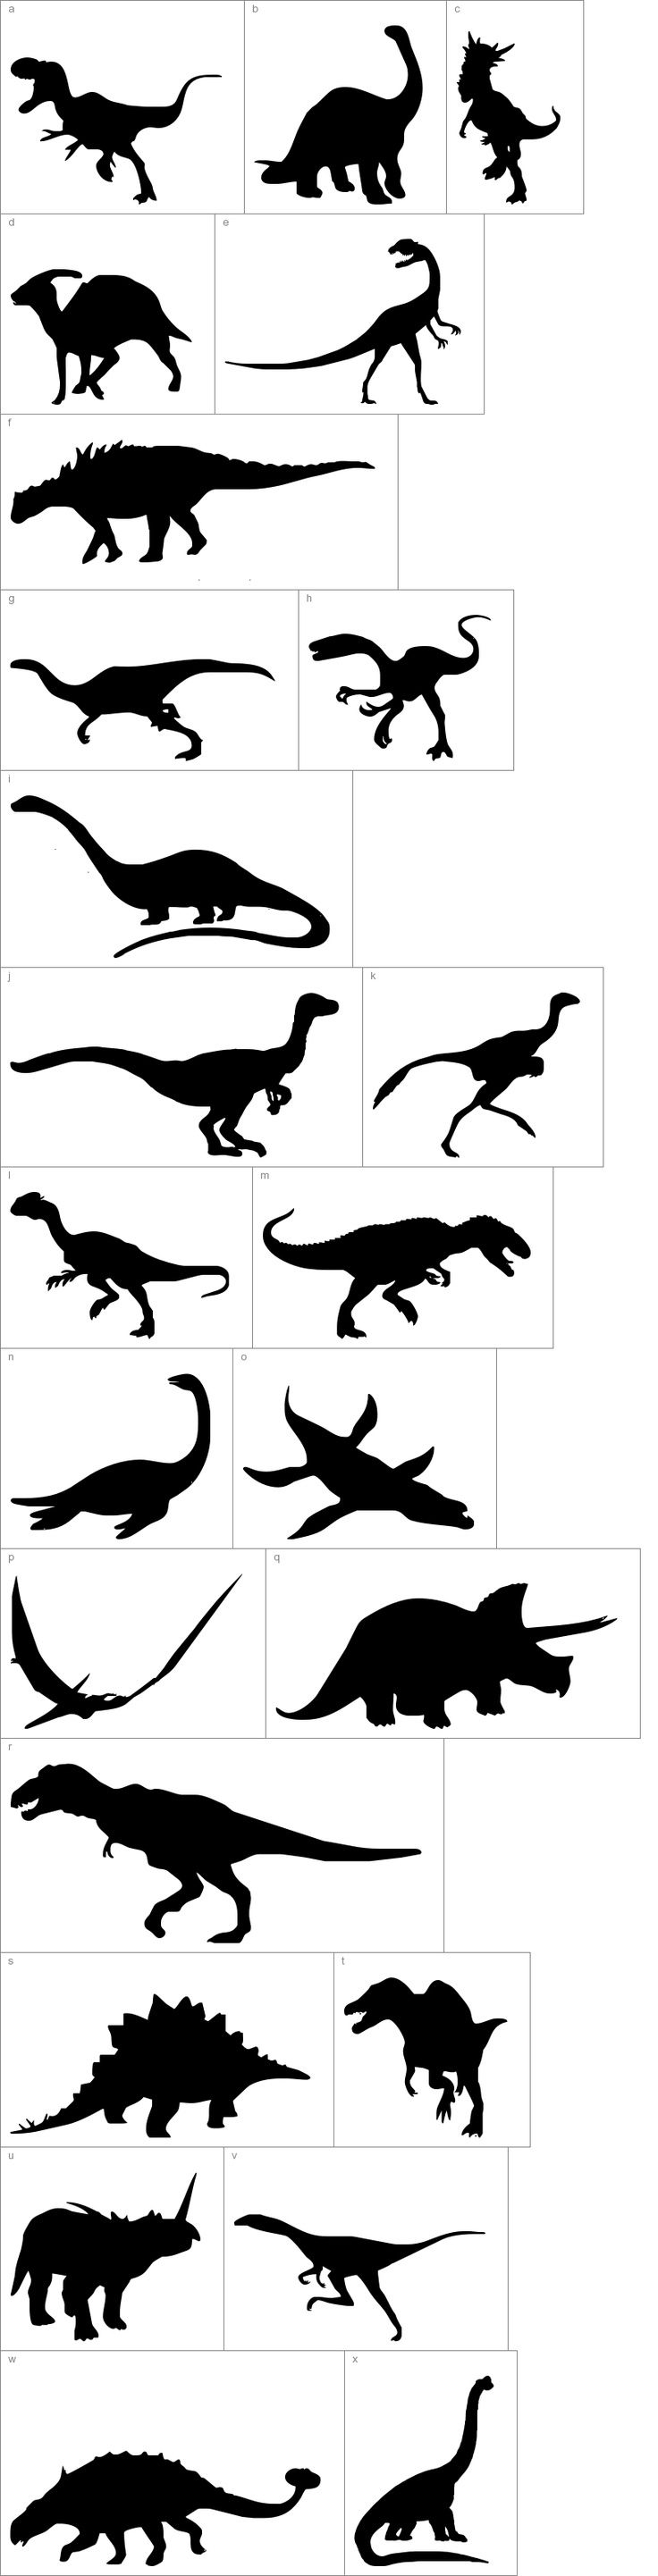 736x2883 Best Dinosaur Template Ideas Dinosaur Stencil